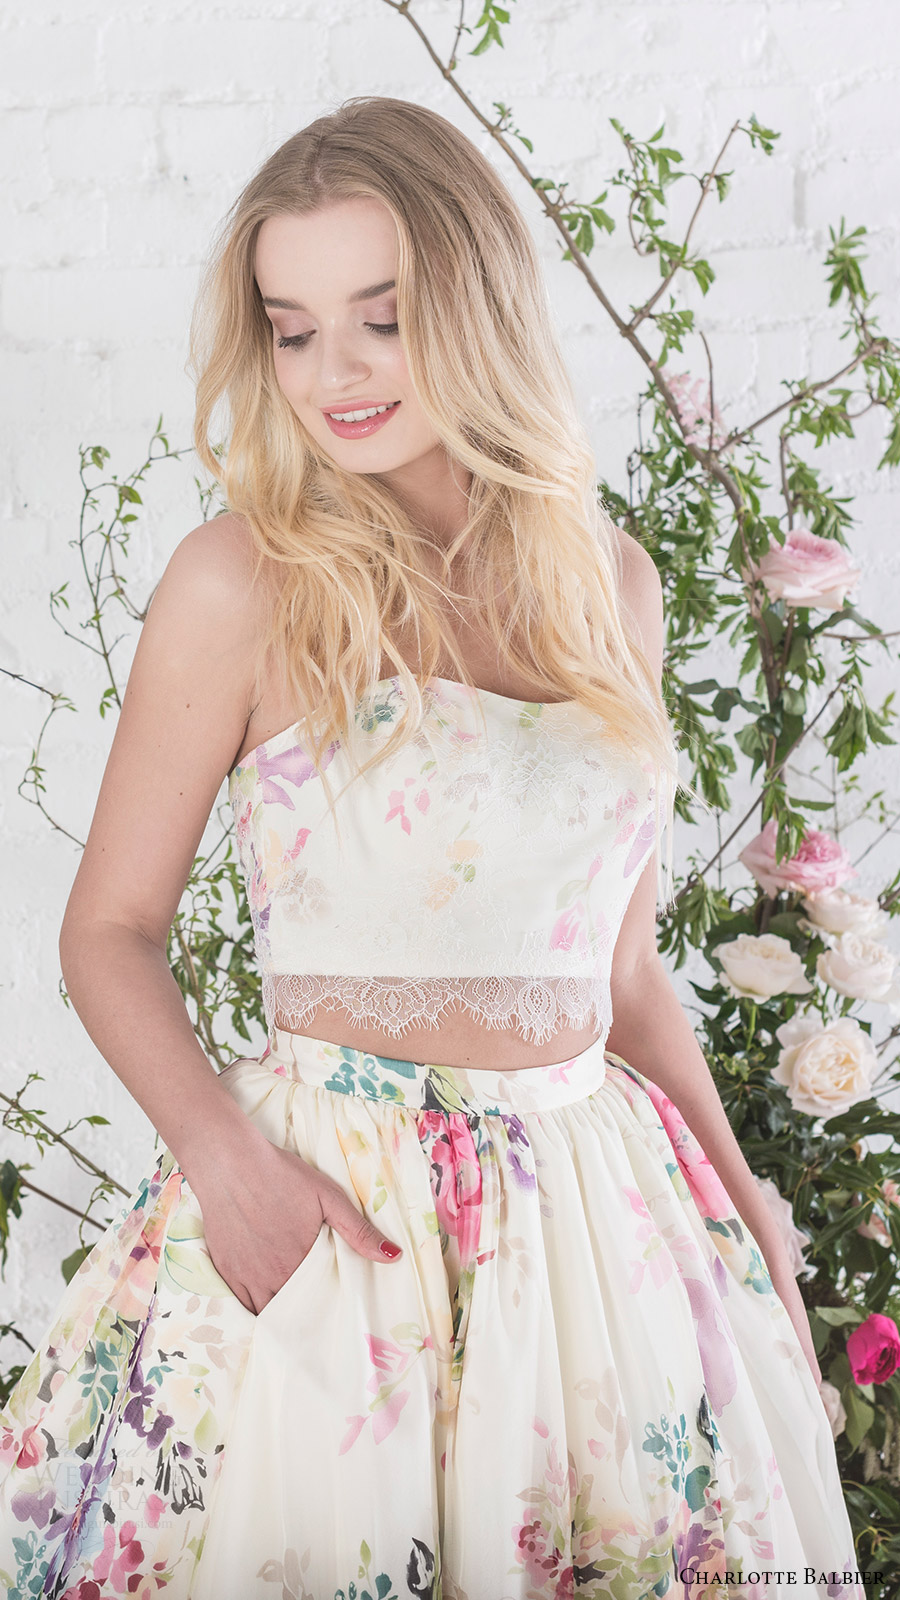 Floral Print Wedding Dresses 53 Superb charlotte balbier bridal strapless